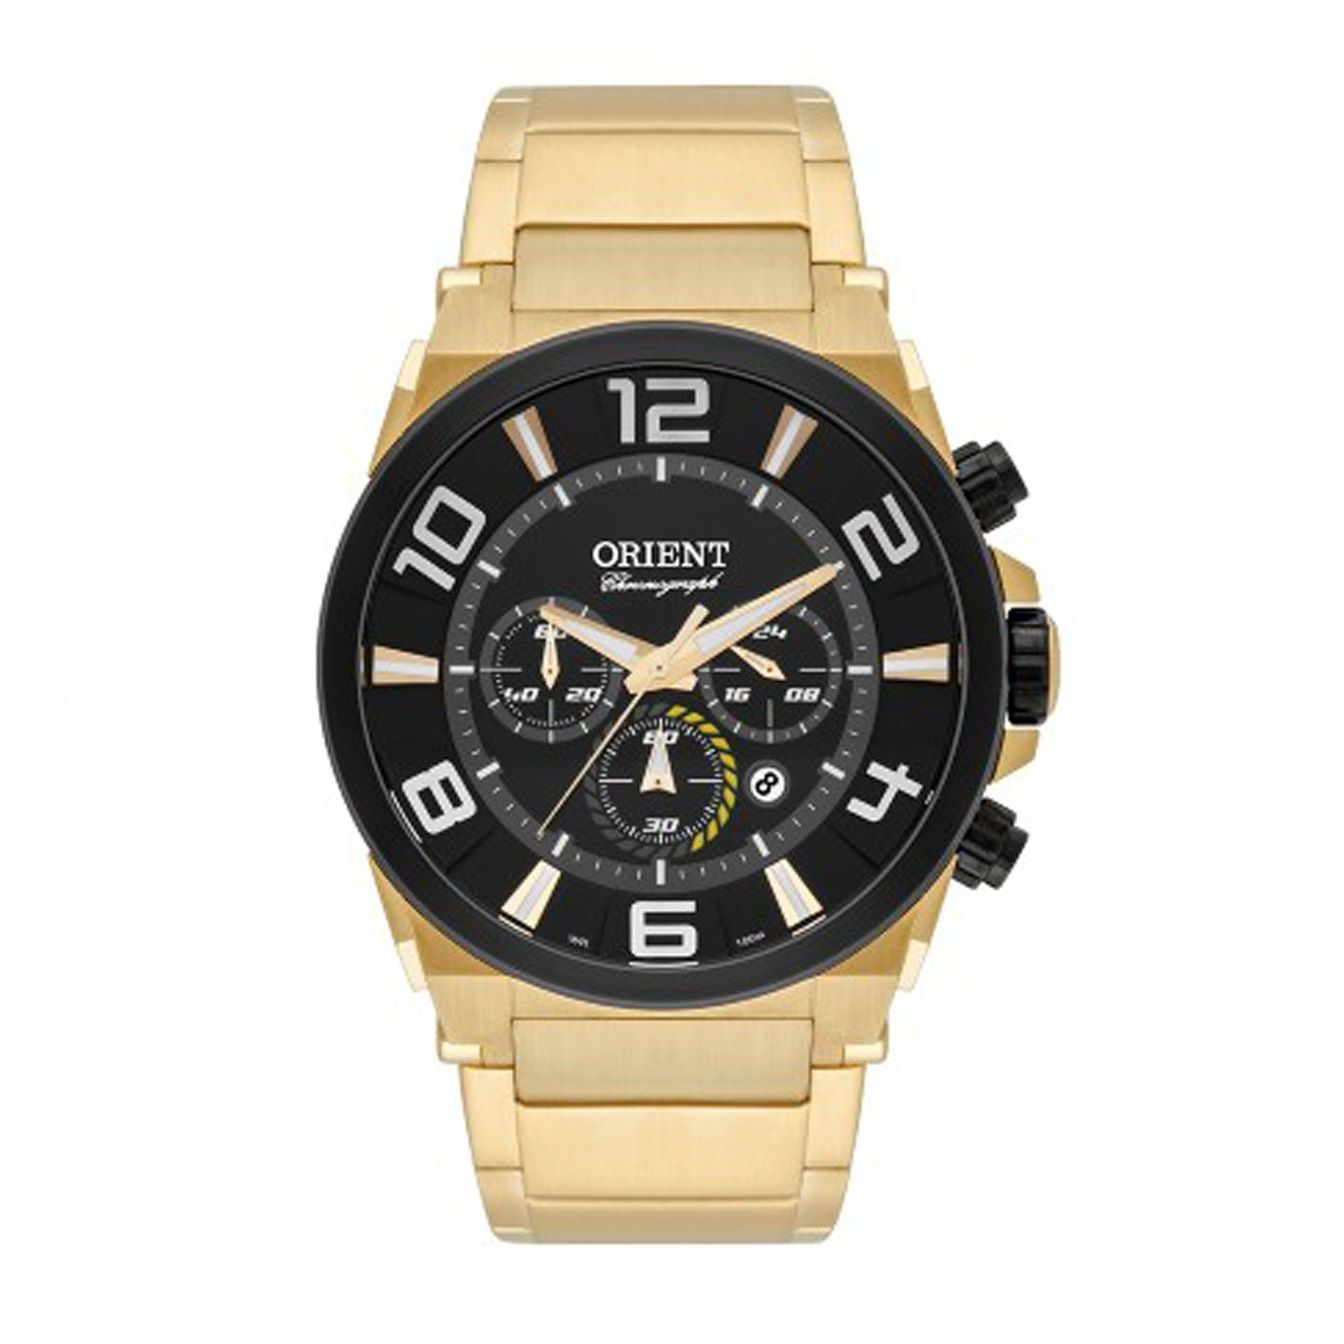 Relógio Orient Cronógrafo Masculino Dourado MGSSC016 P2KX